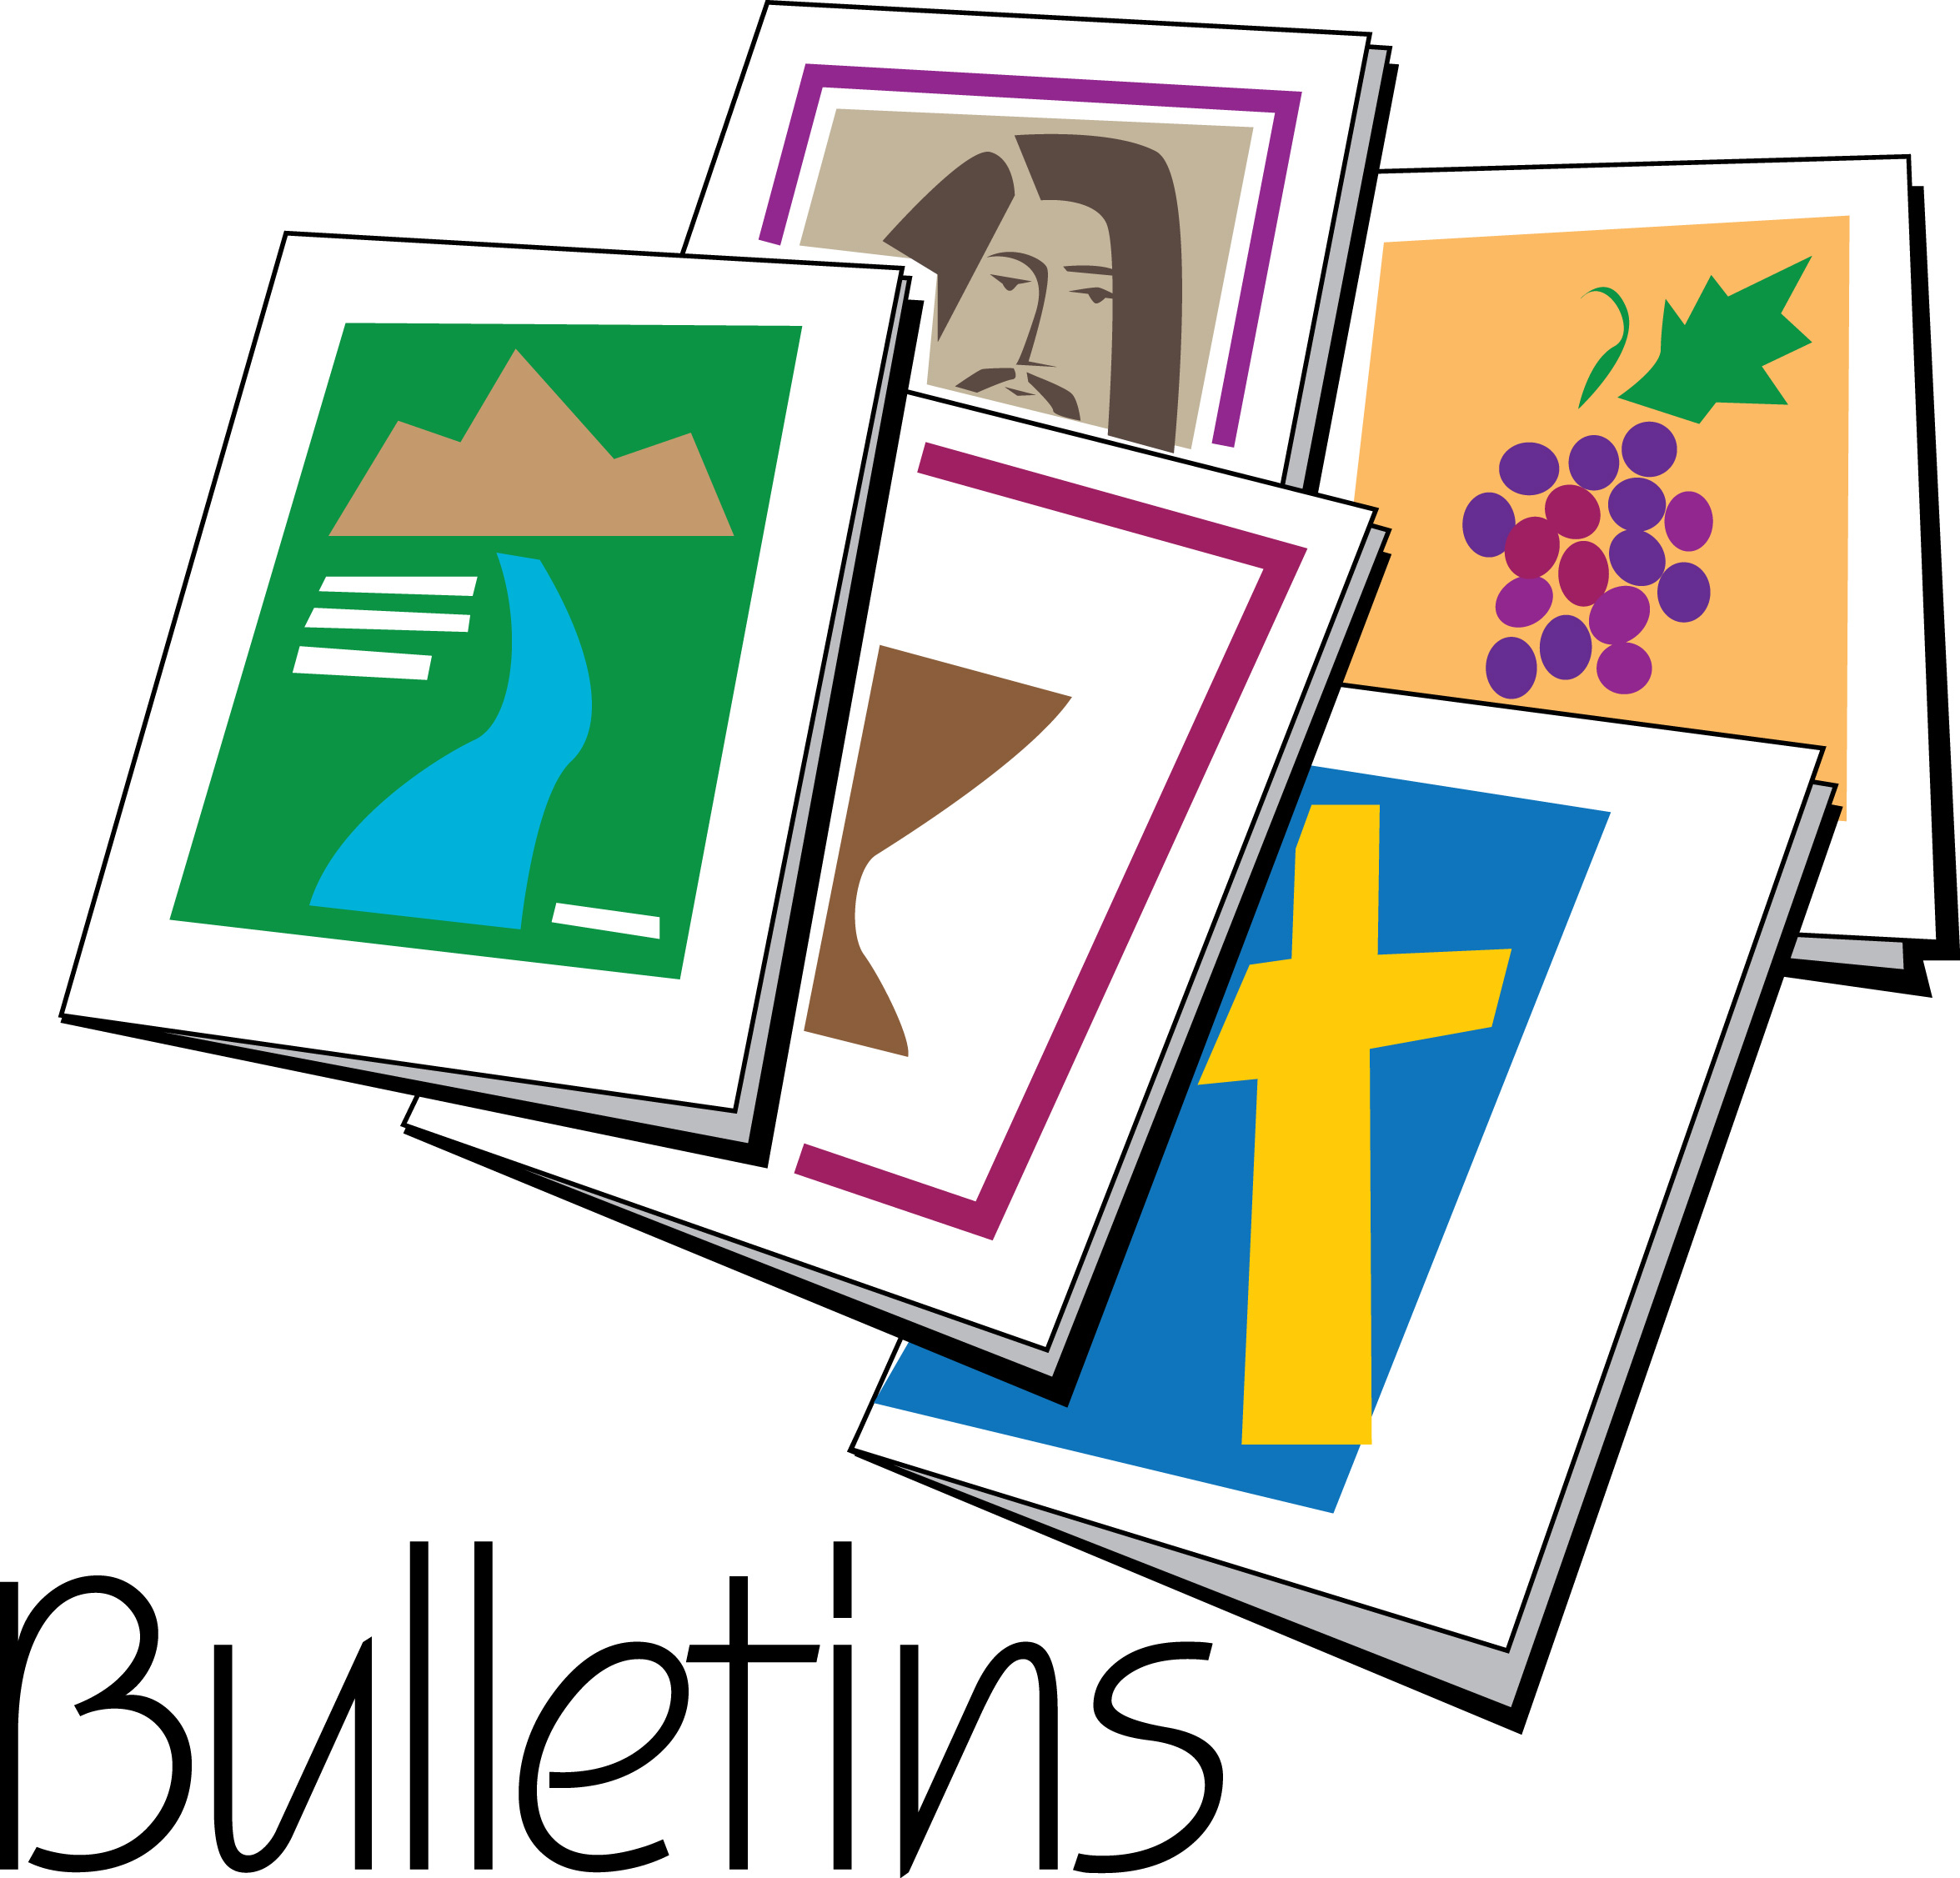 New Member Church Bulletin Clip Art Images free image.